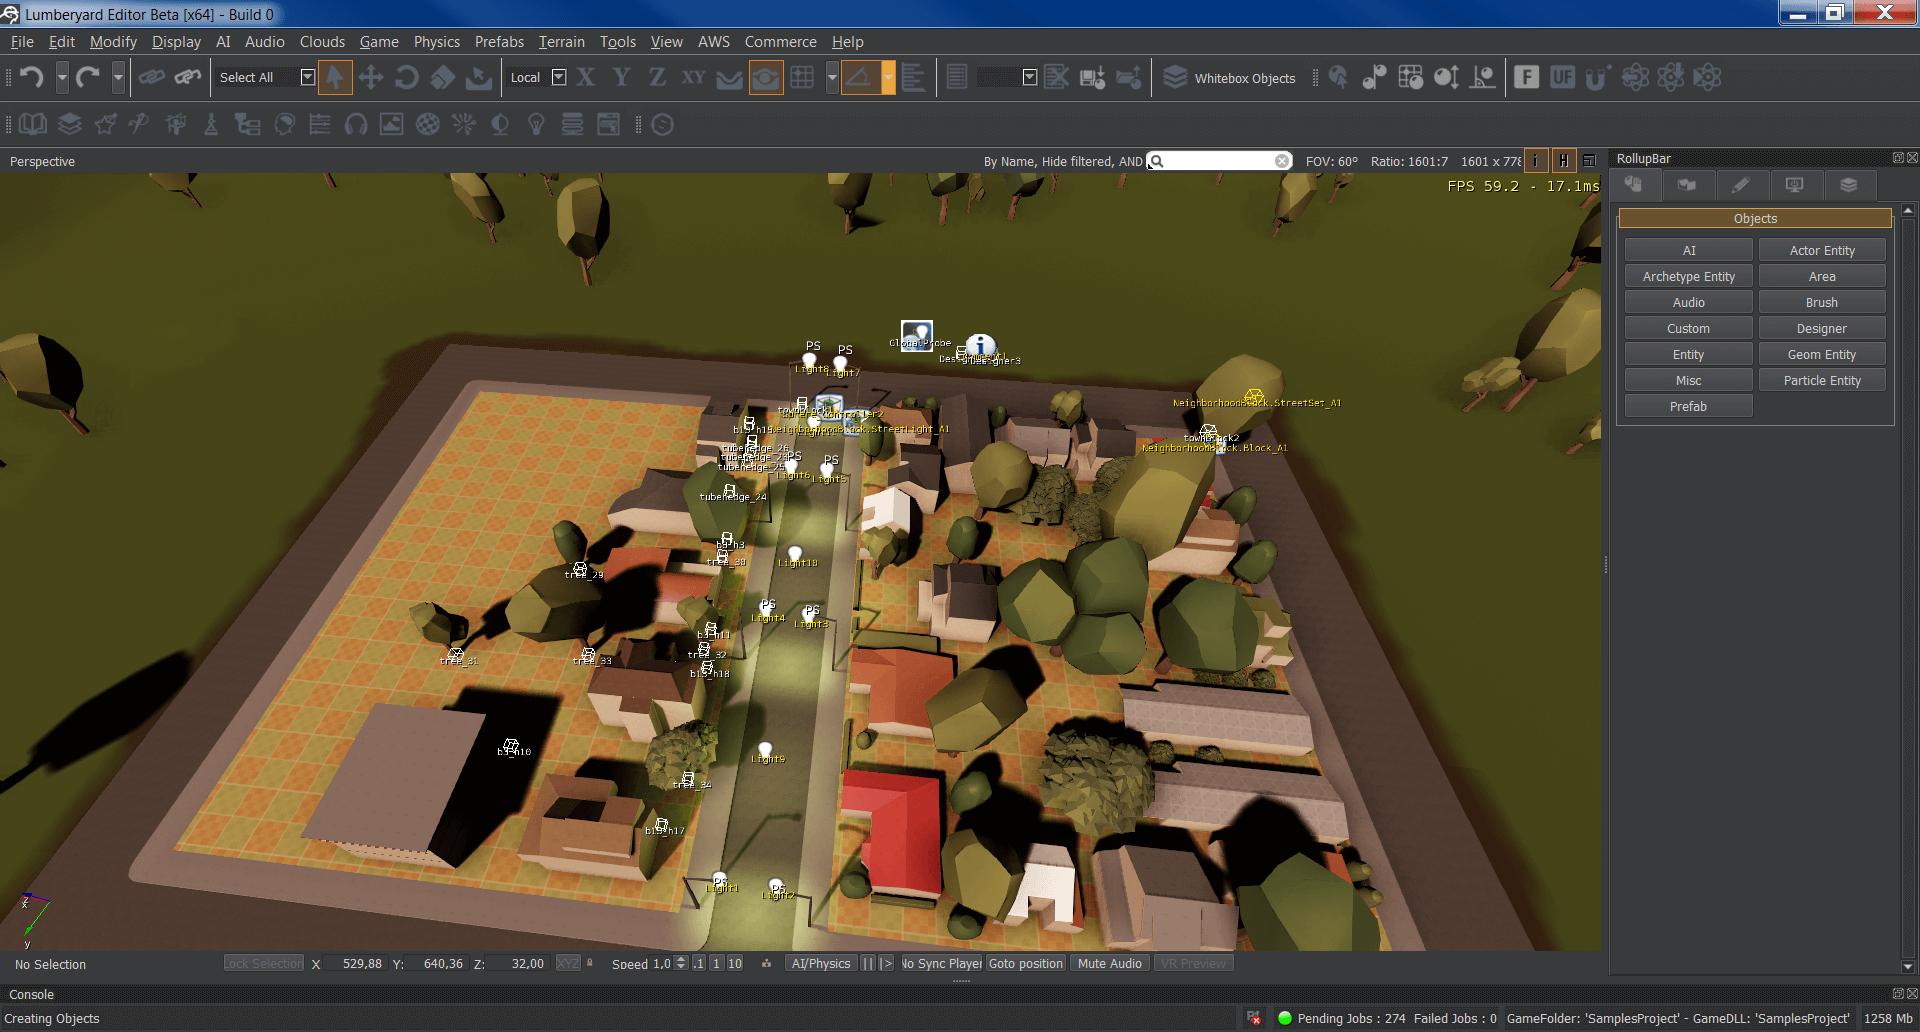 Lumberyard beta 1.5